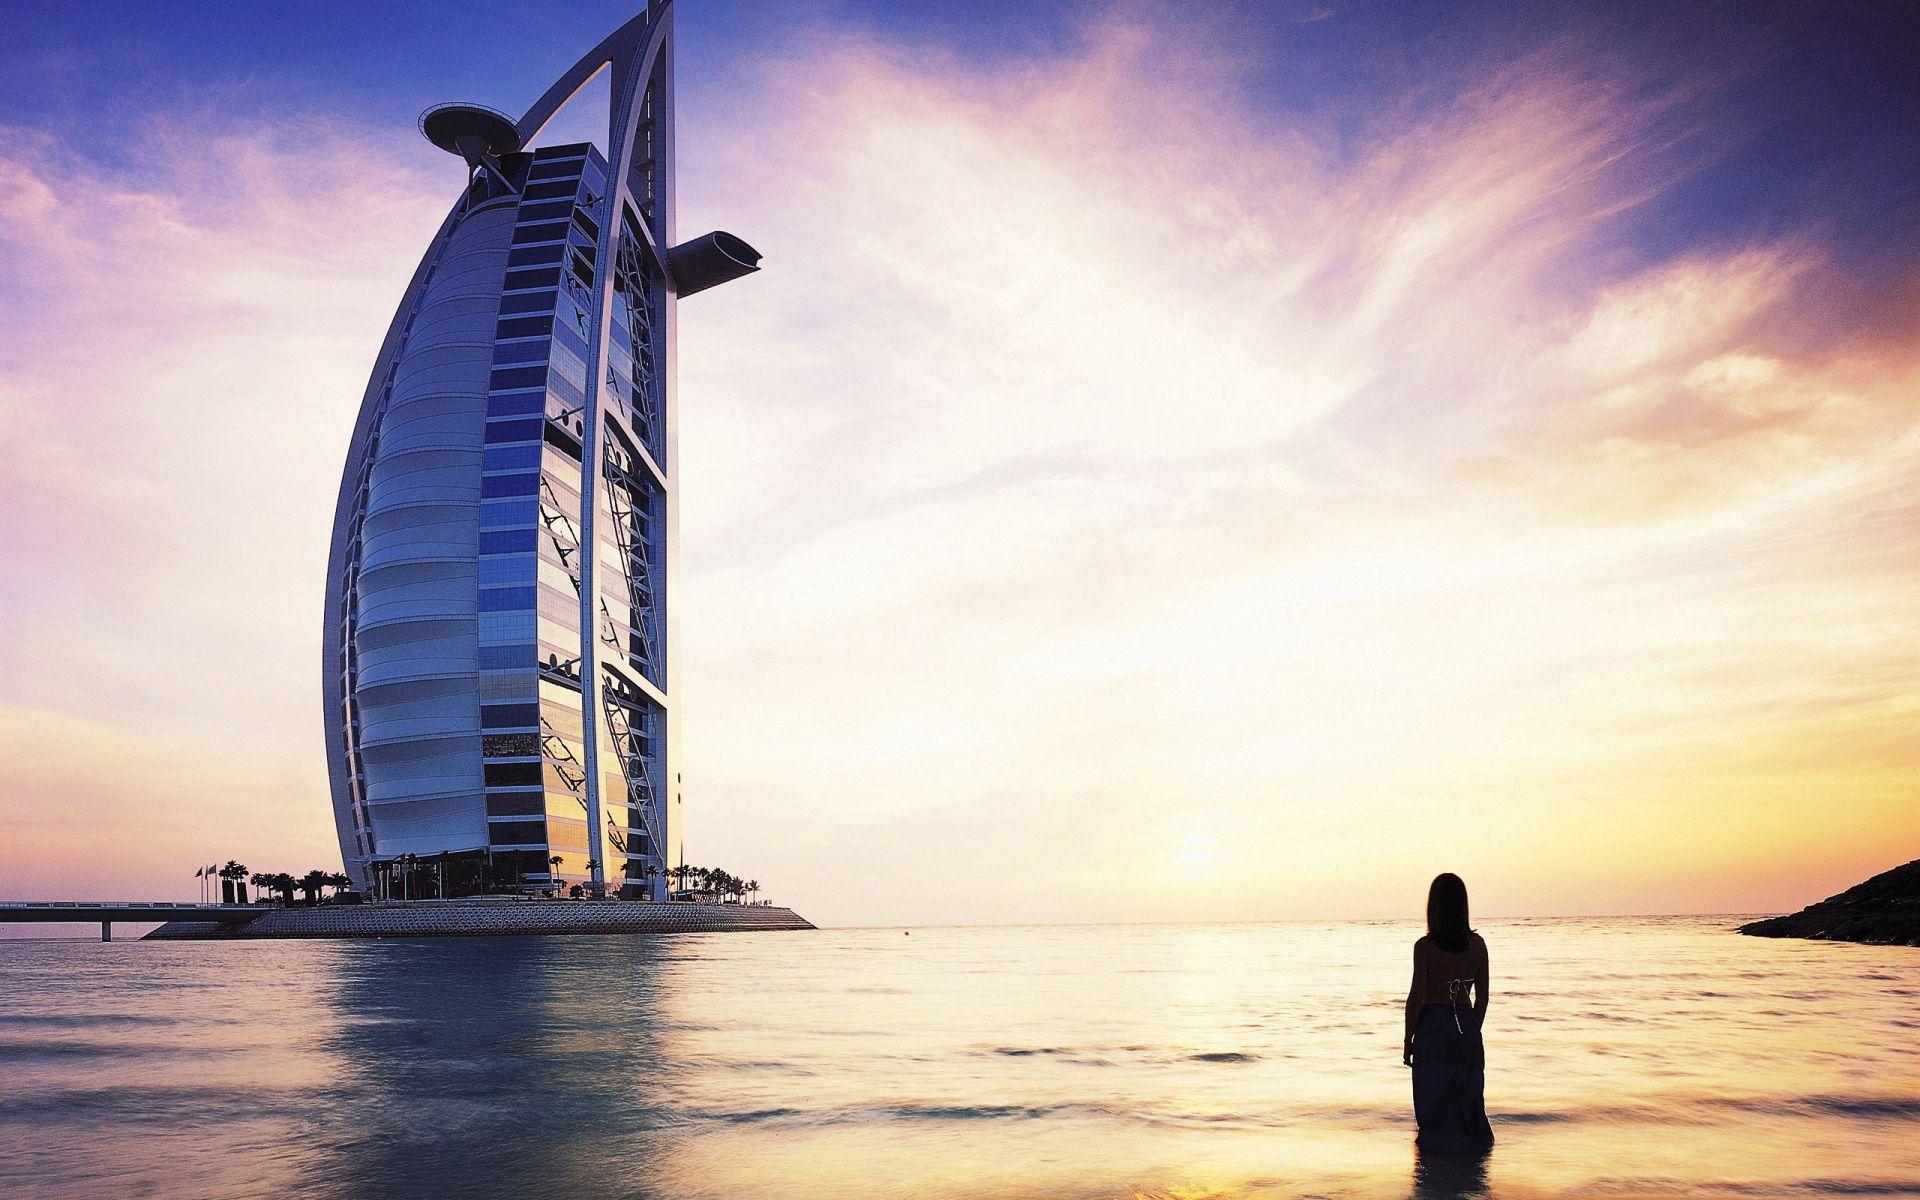 130799 free wallpaper 2160x3840 for phone, download images Cities, Silhouette, Dubai, Girl, Burj Al-Arab, Burj Al Arab 2160x3840 for mobile